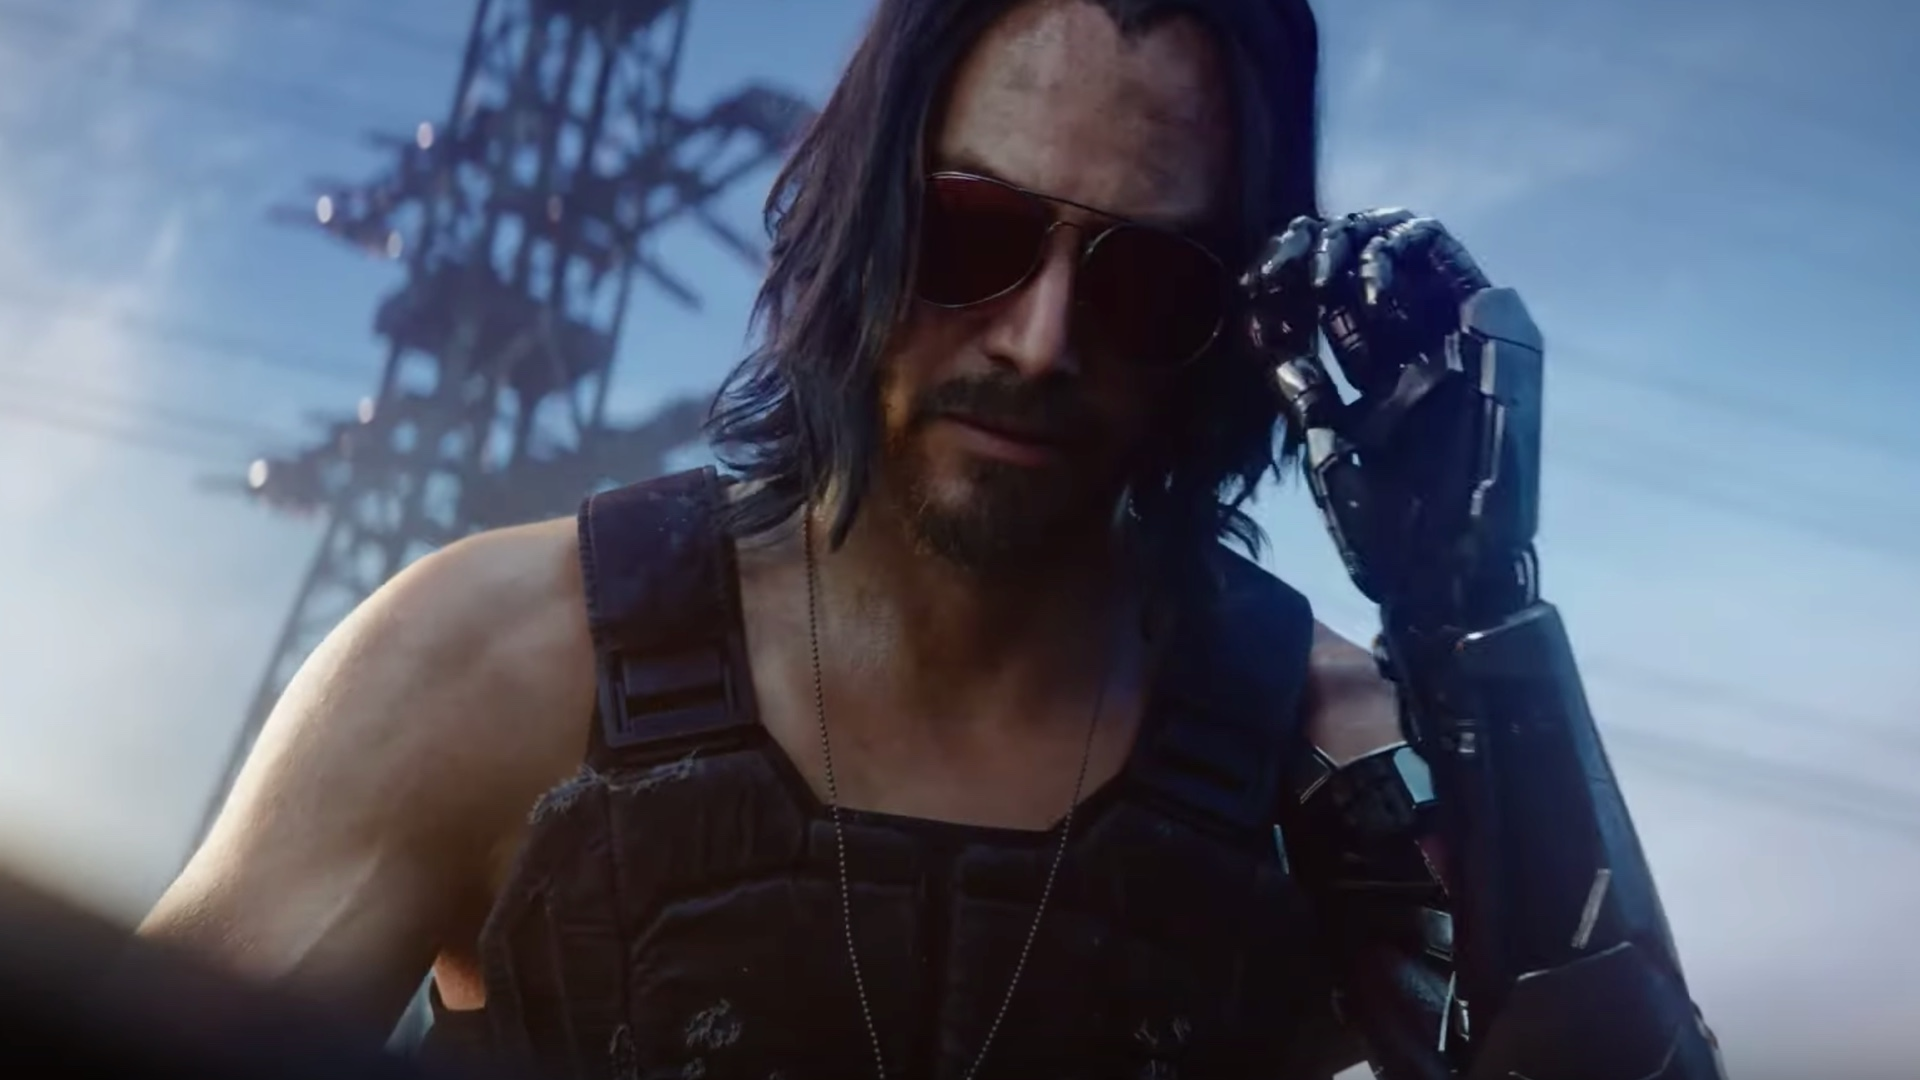 Cyberpunk 2077 | توضیحات سیدی پراجکت رد در مورد شخصیت Johnny Silverhand